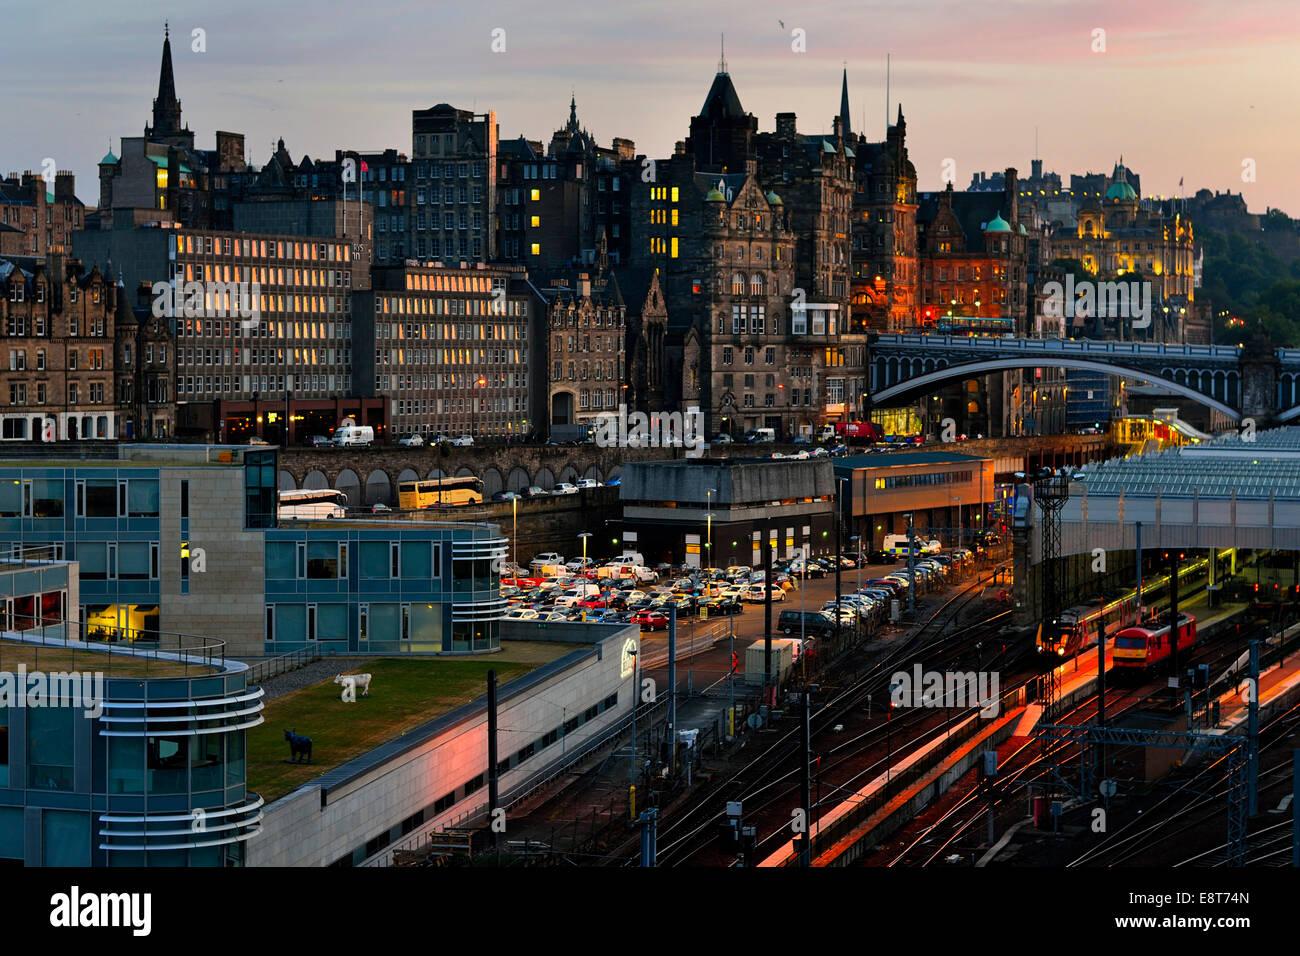 View over railway station on old town at dusk, Edinburgh, Scotland, United Kingdom - Stock Image